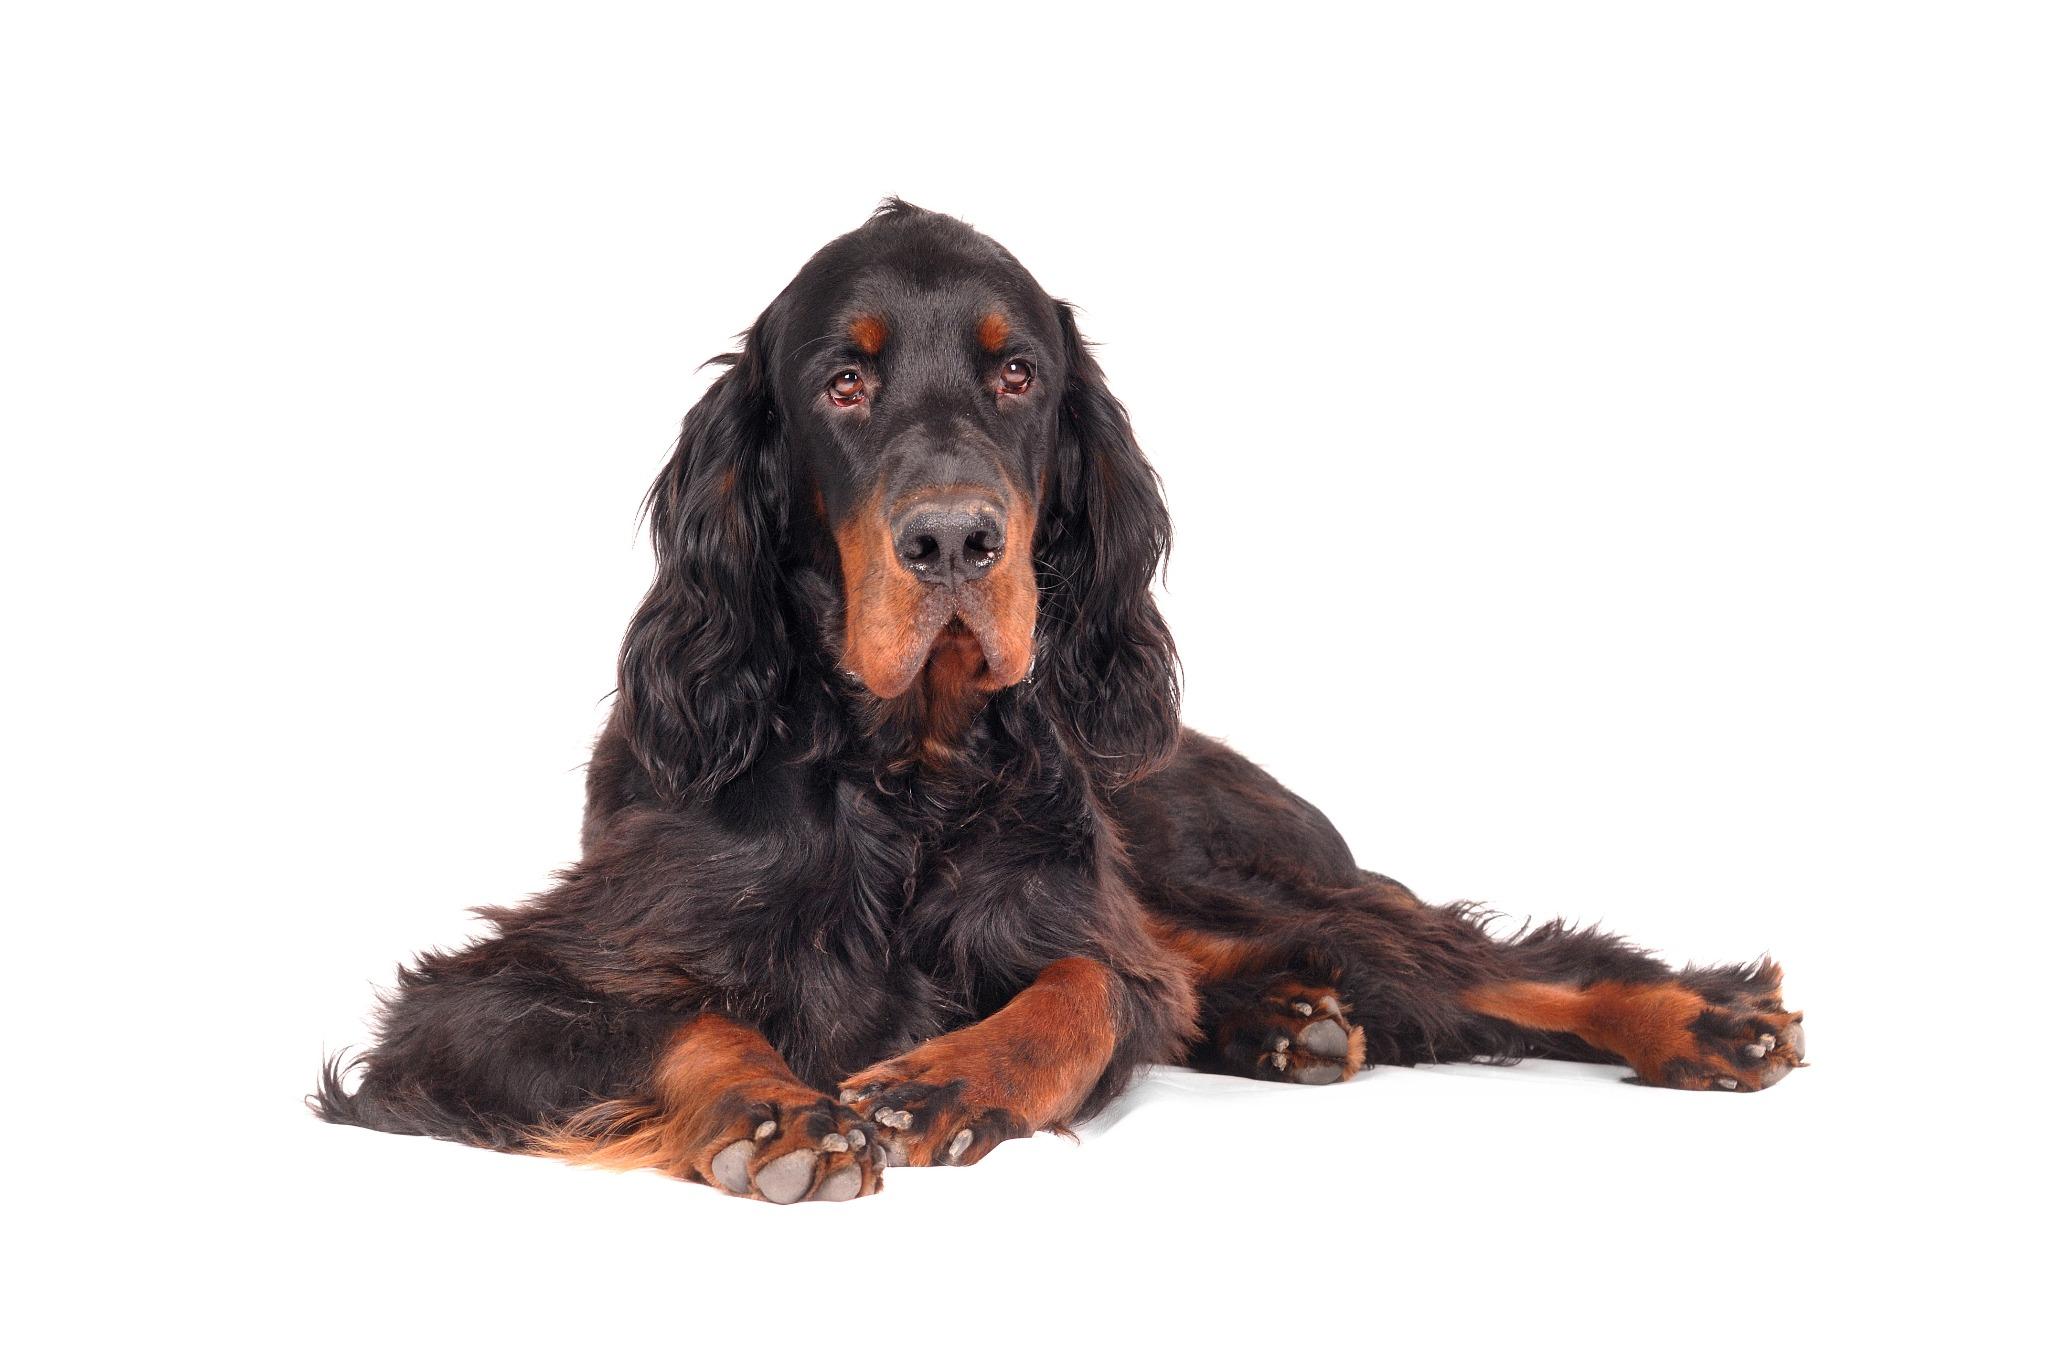 A portrait of a Gordon Setter, a Scottish dog breed.